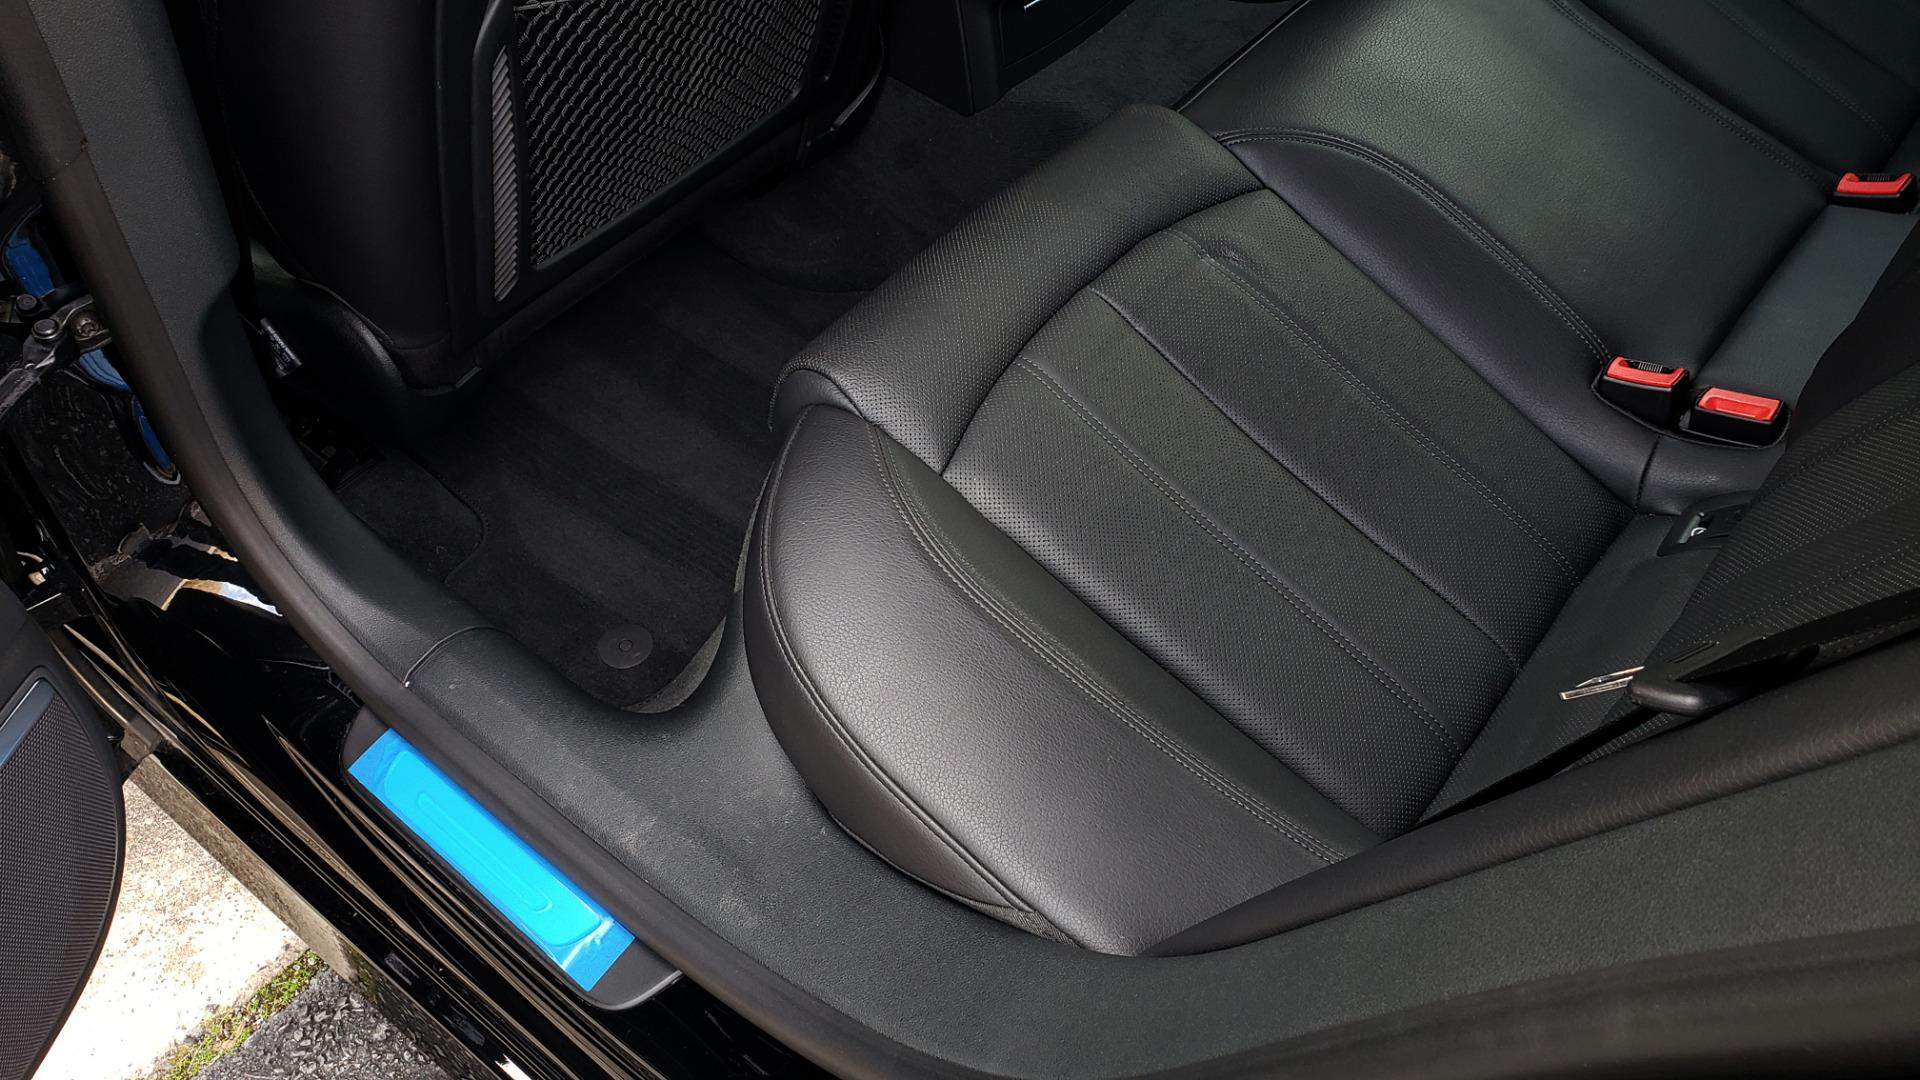 Used 2017 Audi A7 PRESTIGE / DRVR ASST / S-LINE SPORT / NAV / REARVIEW for sale Sold at Formula Imports in Charlotte NC 28227 61